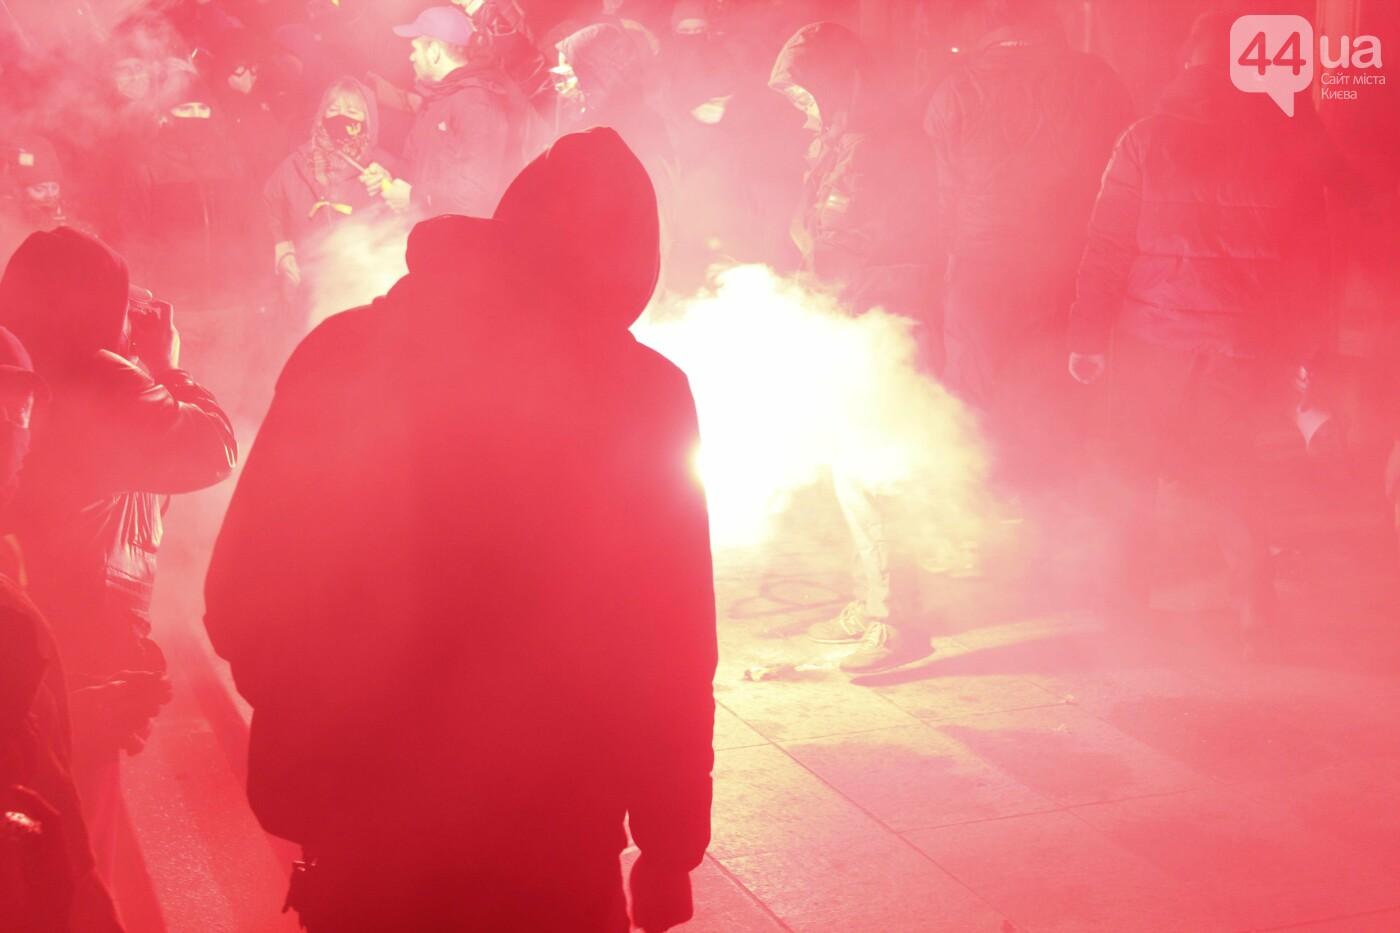 Сожгли табличку и разбили окна: акция в поддержку Стерненко переросла в беспорядки, - ФОТО, фото-17, Фото: 44.ua